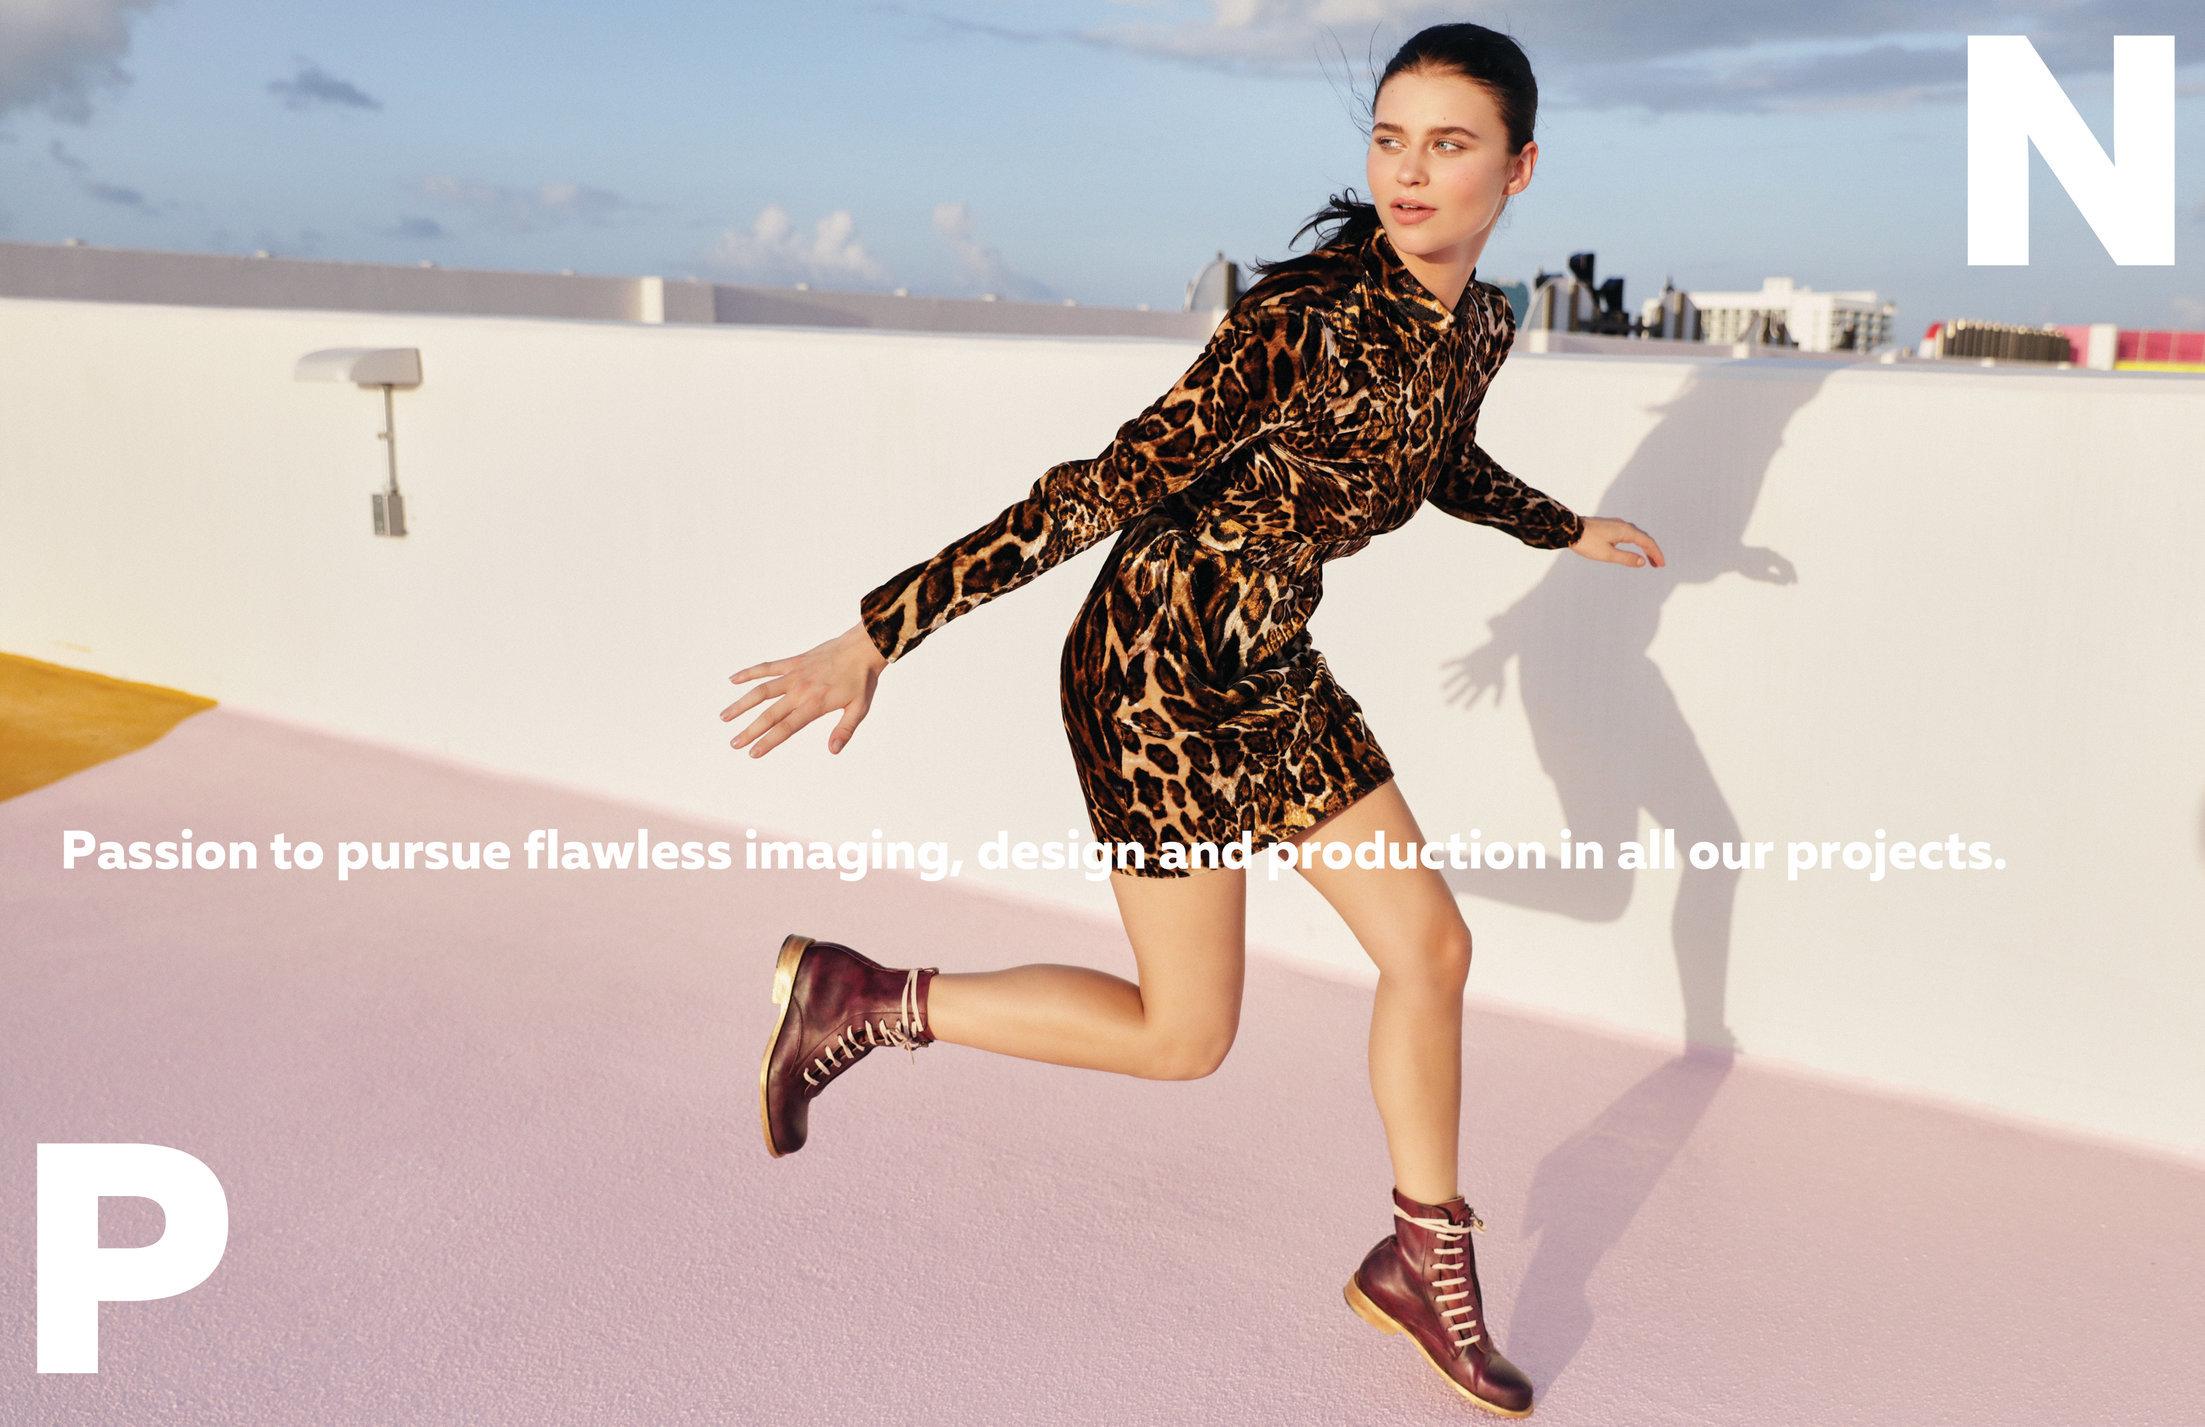 studio_b_x_production_fashion-photographer-nico-stipcianos-miami-copy-29.jpg